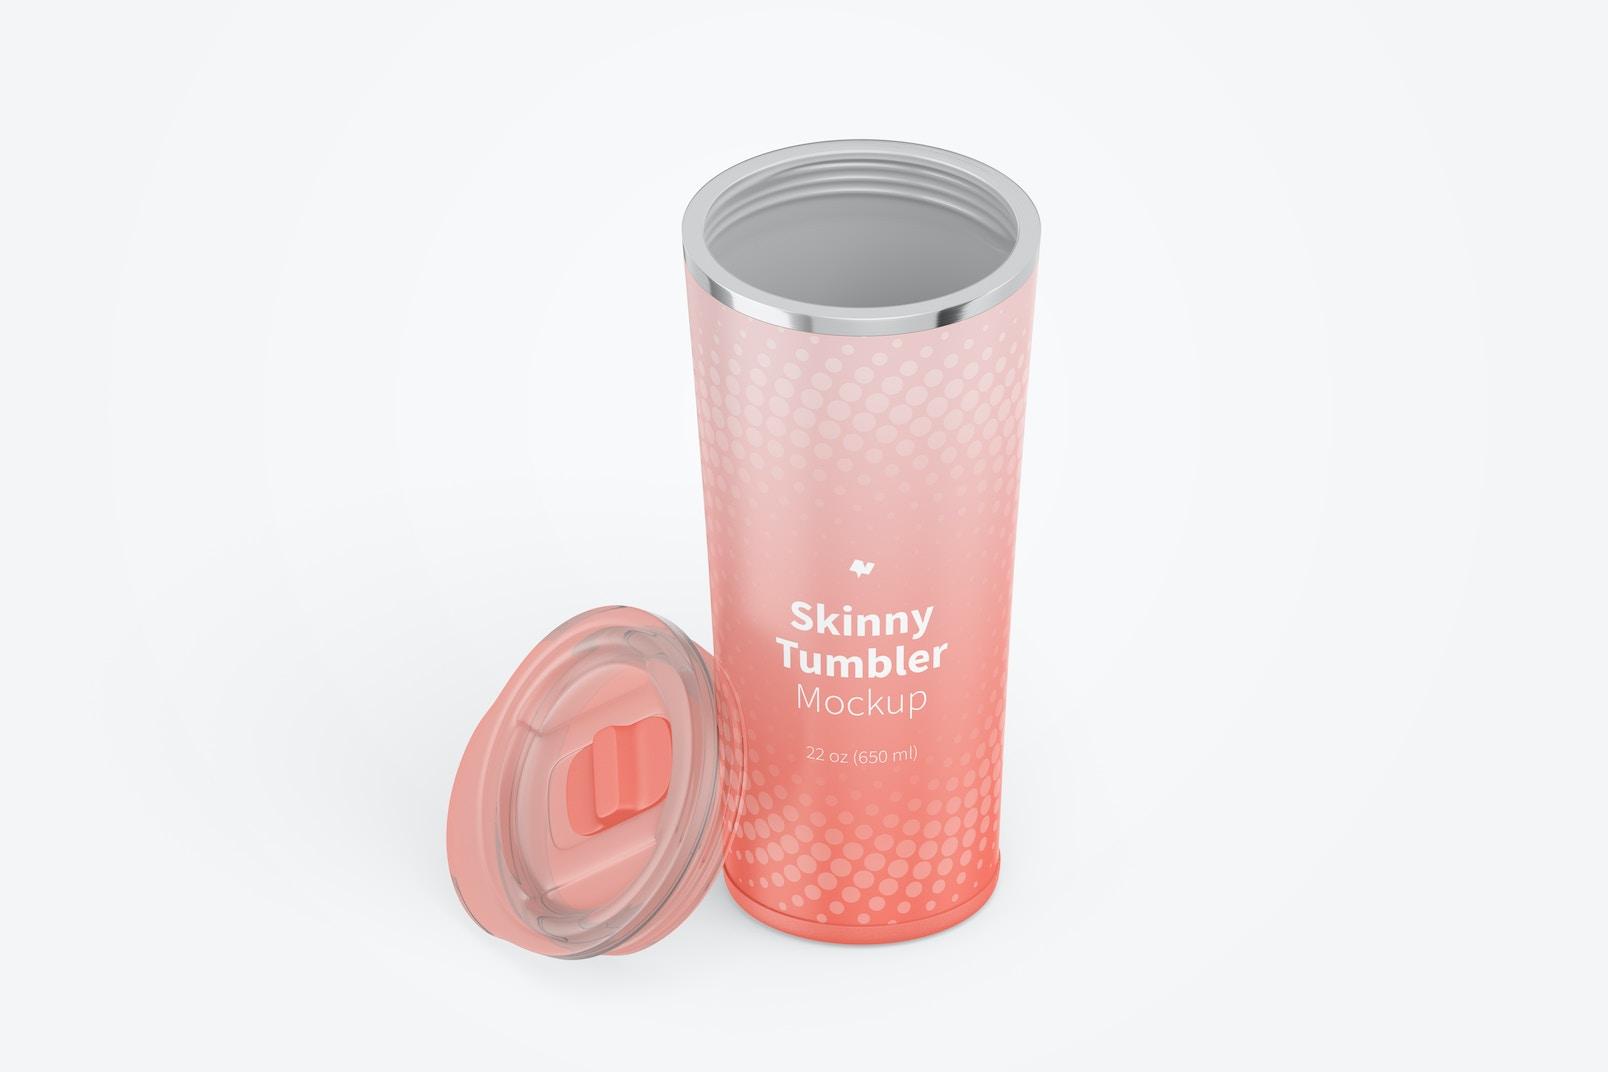 22 oz Skinny Tumbler Mockup, Isometric View